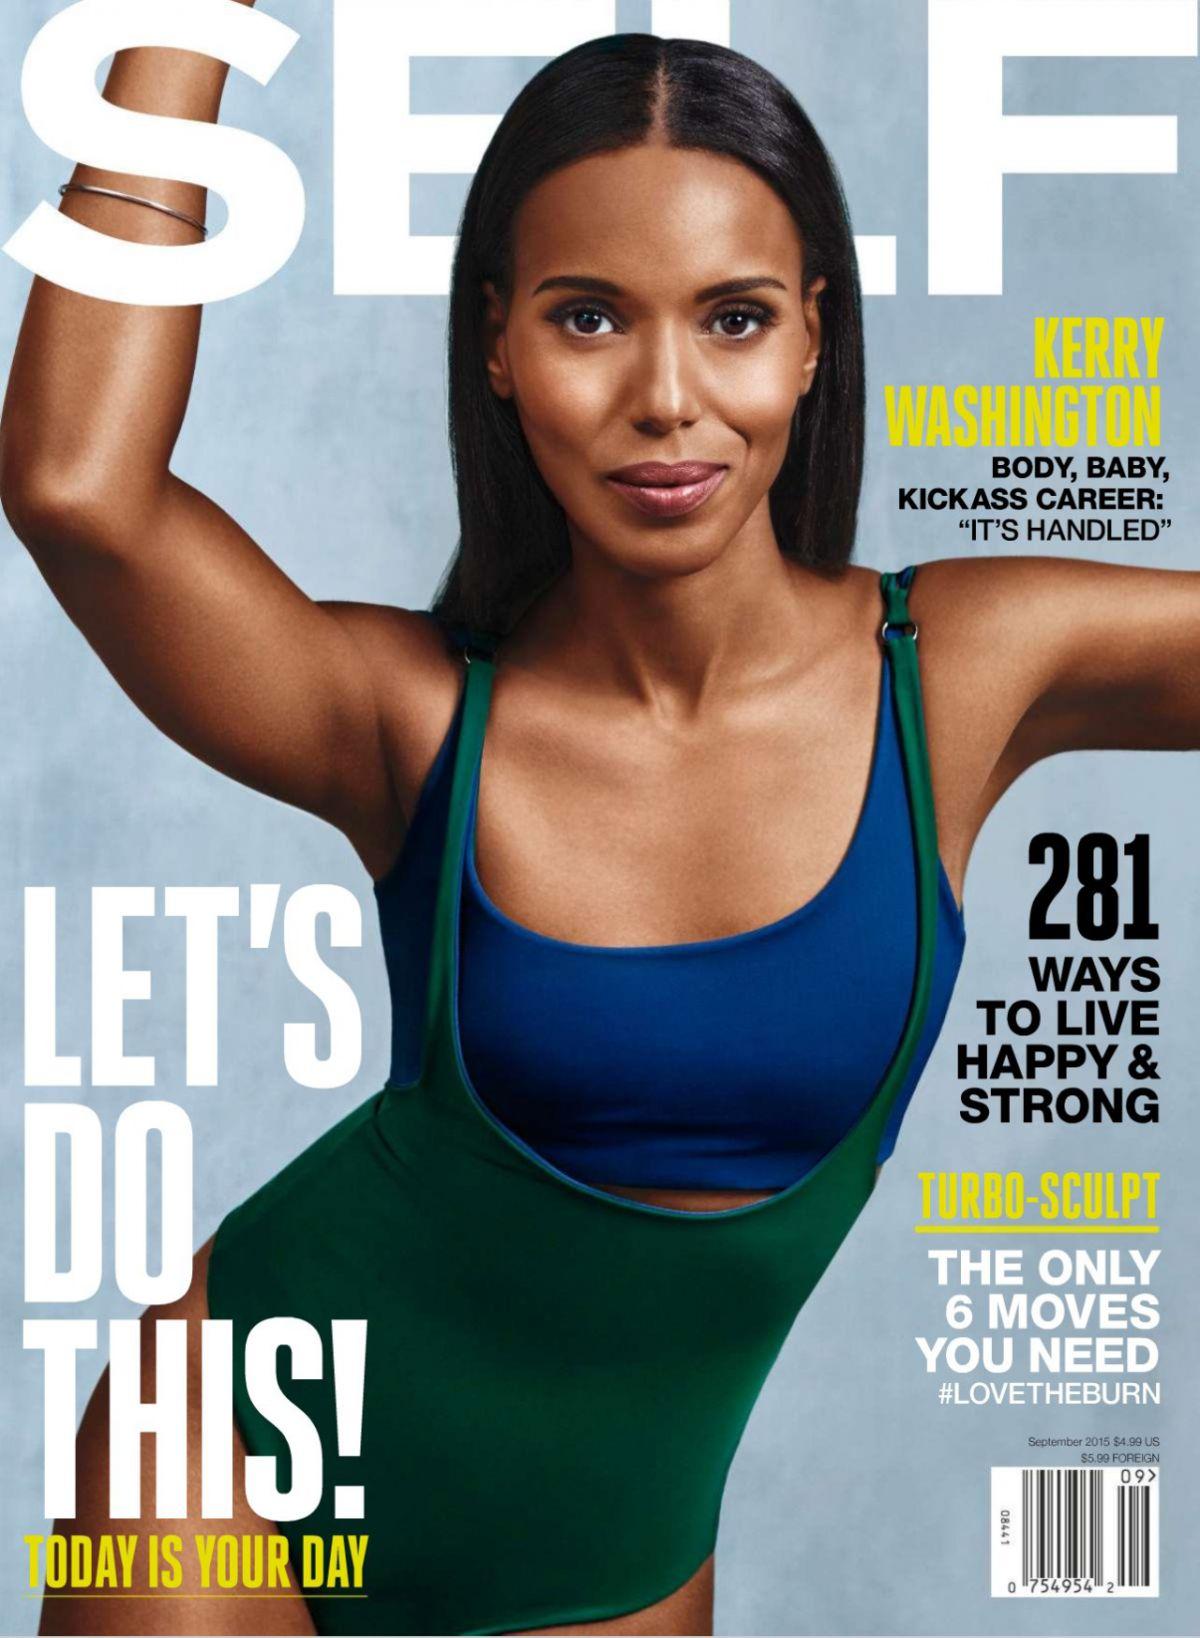 KERRY WASHINGTON in Self Magazine, September 2015 Issue